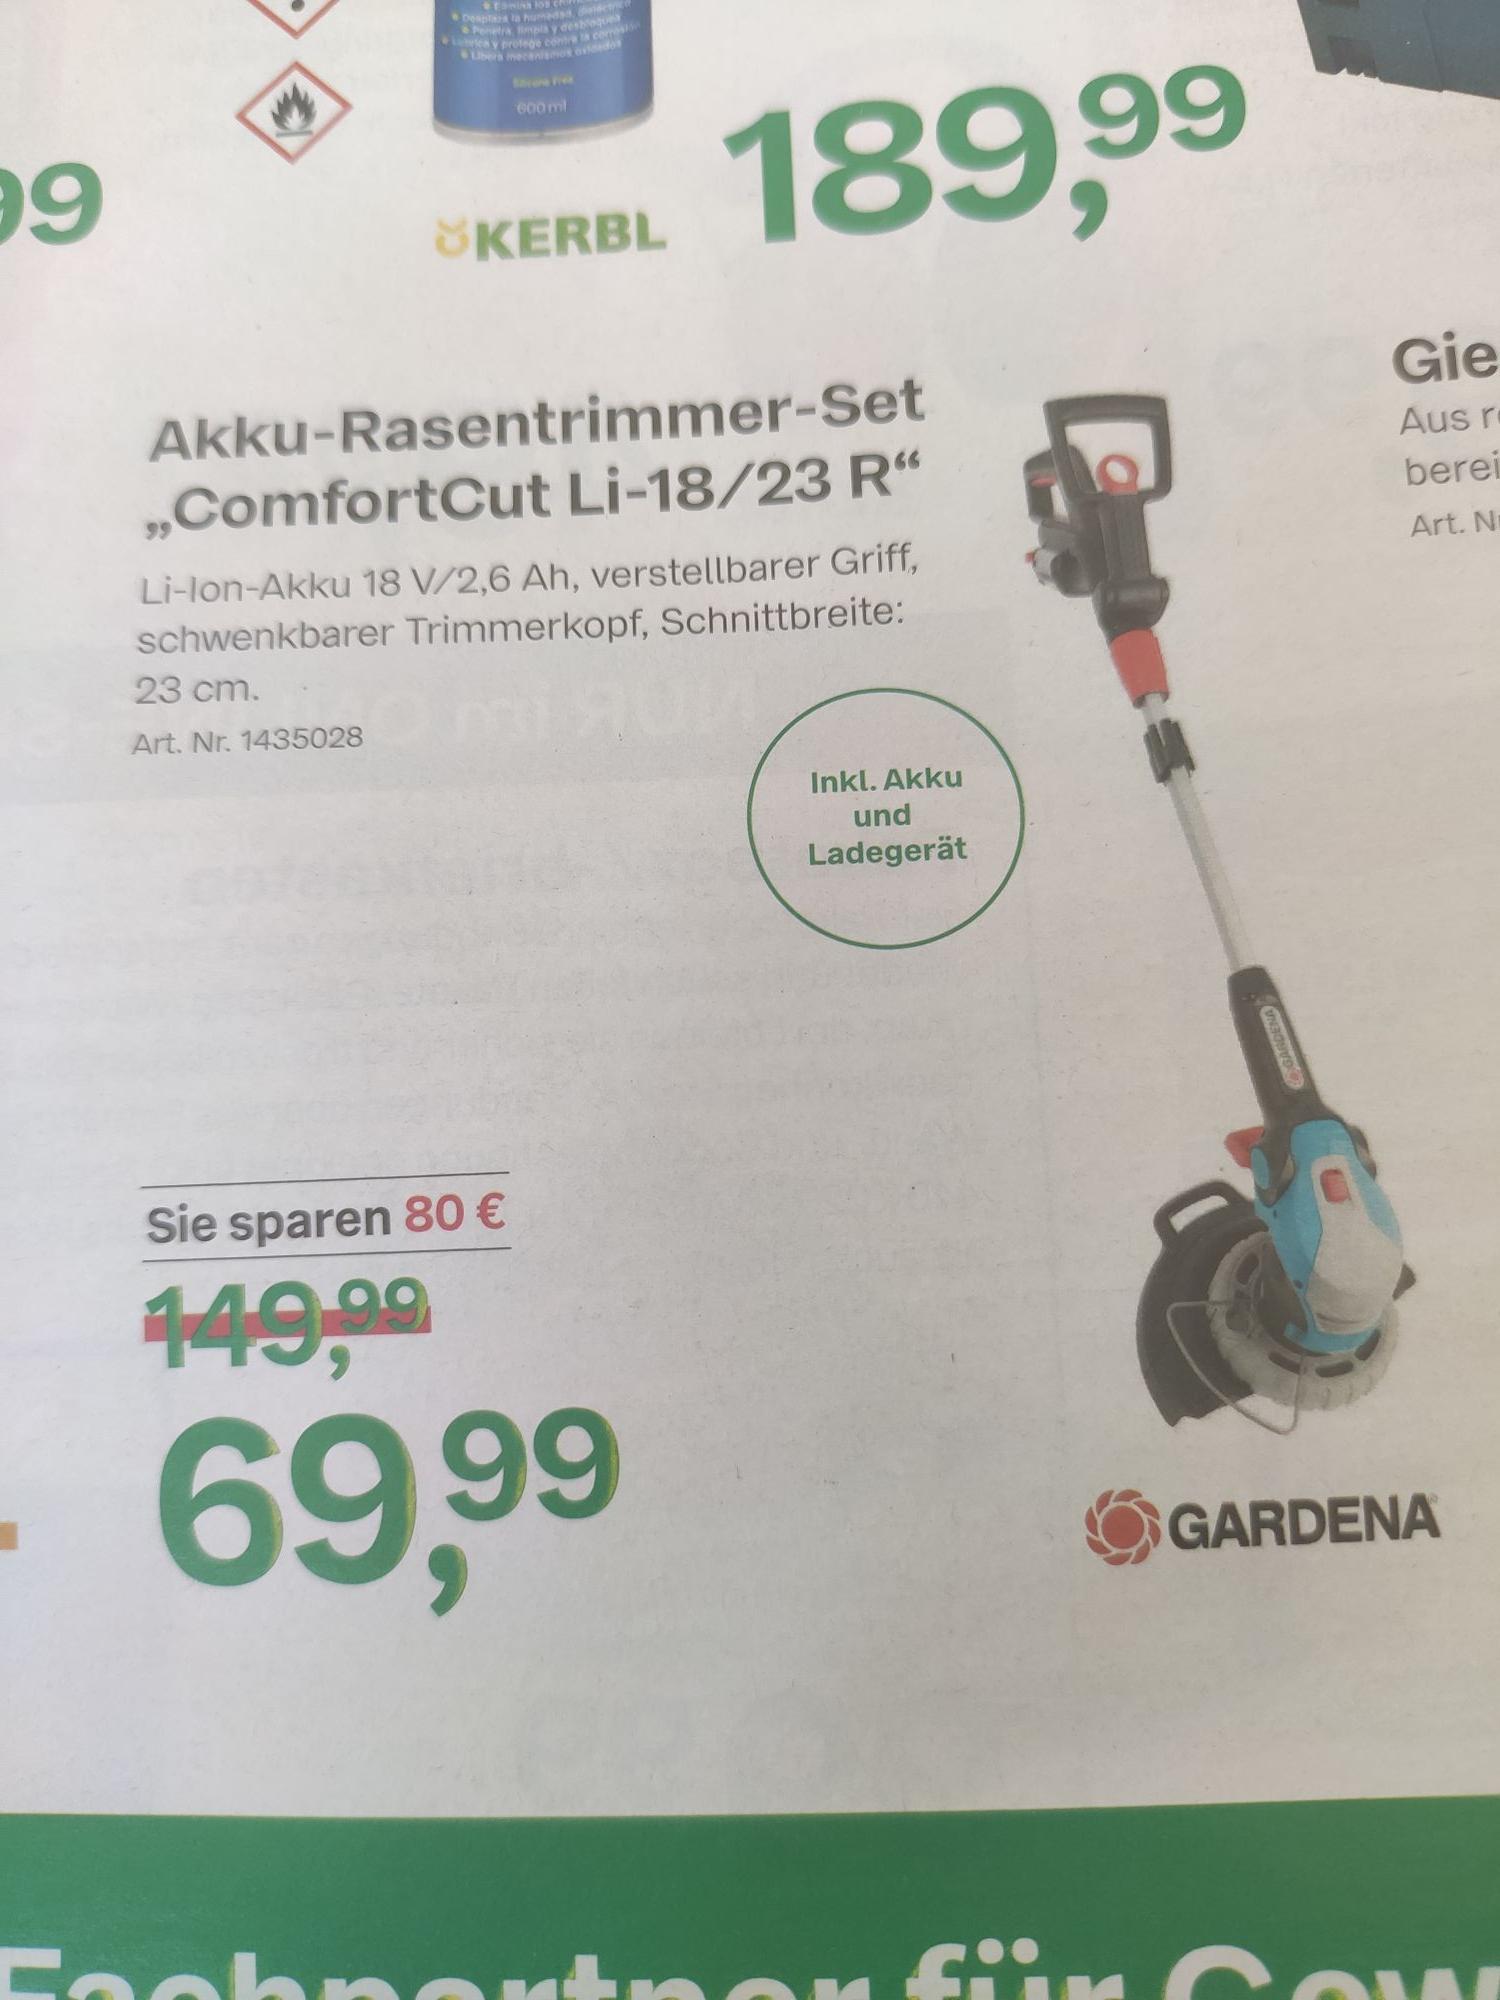 Gardena ComfortCut Li-18/23R Rasentrimmer inkl Akku und Ladegerät BayWa Baustoffe Bayern